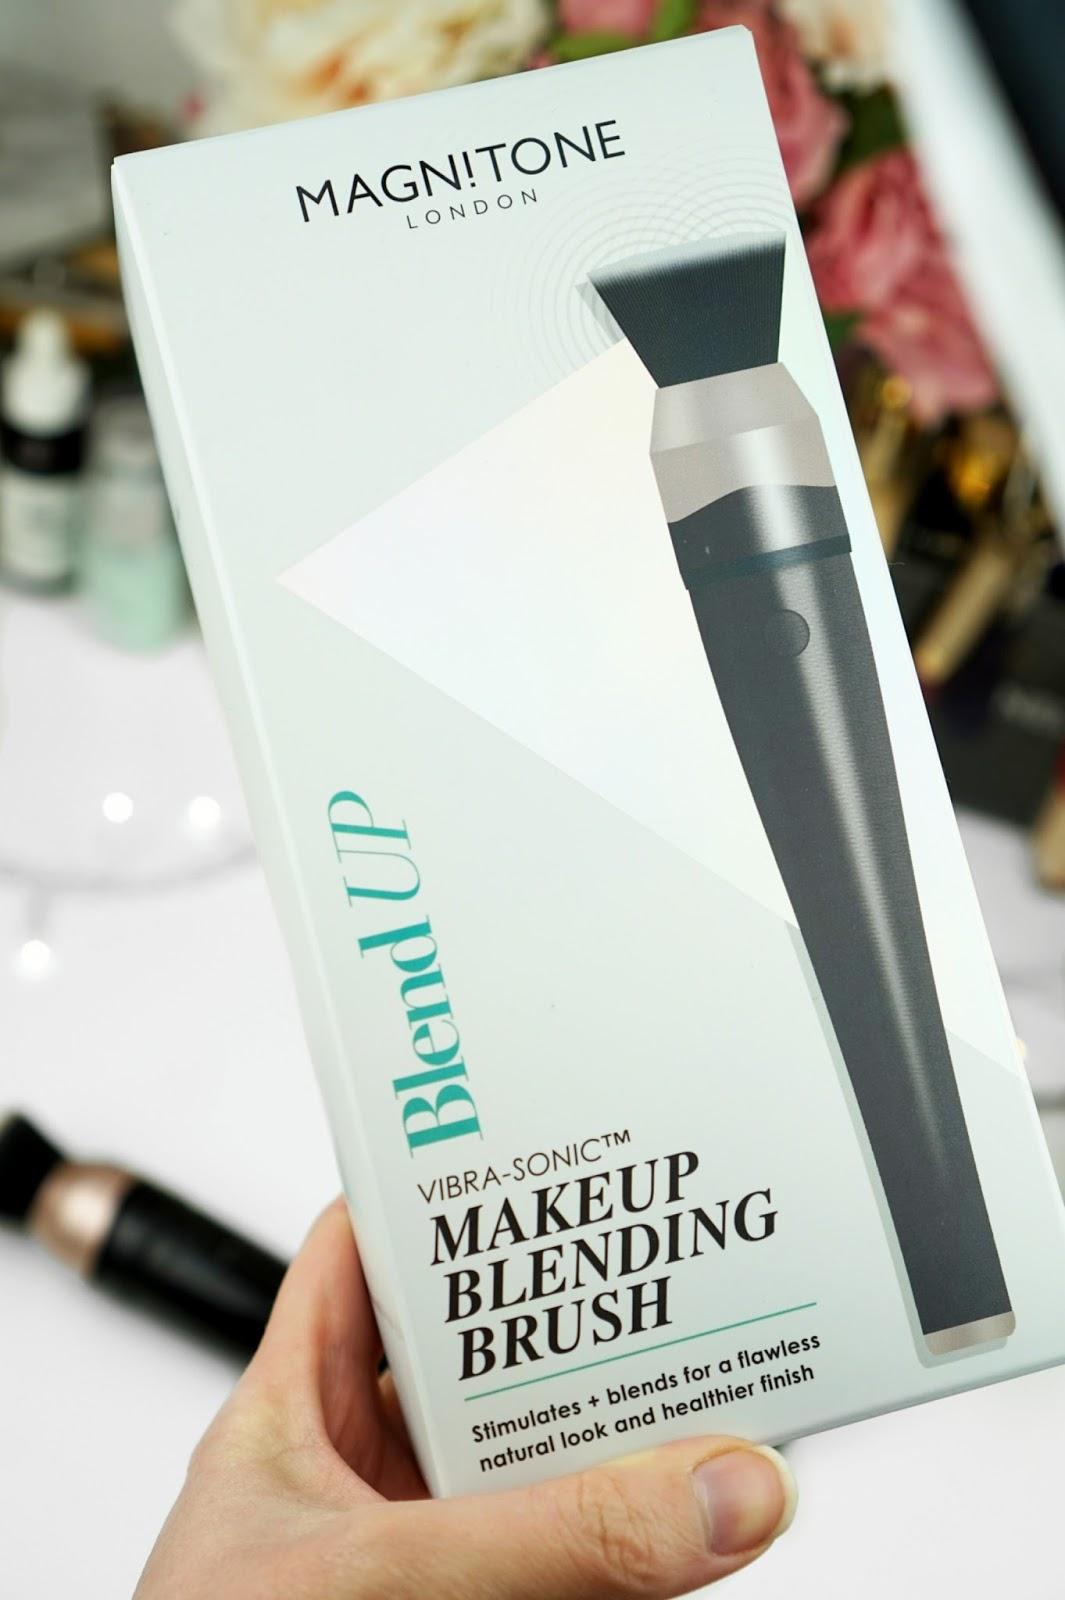 Magnitone_London_BlendUp_Makeup_Blending_Brush_Box